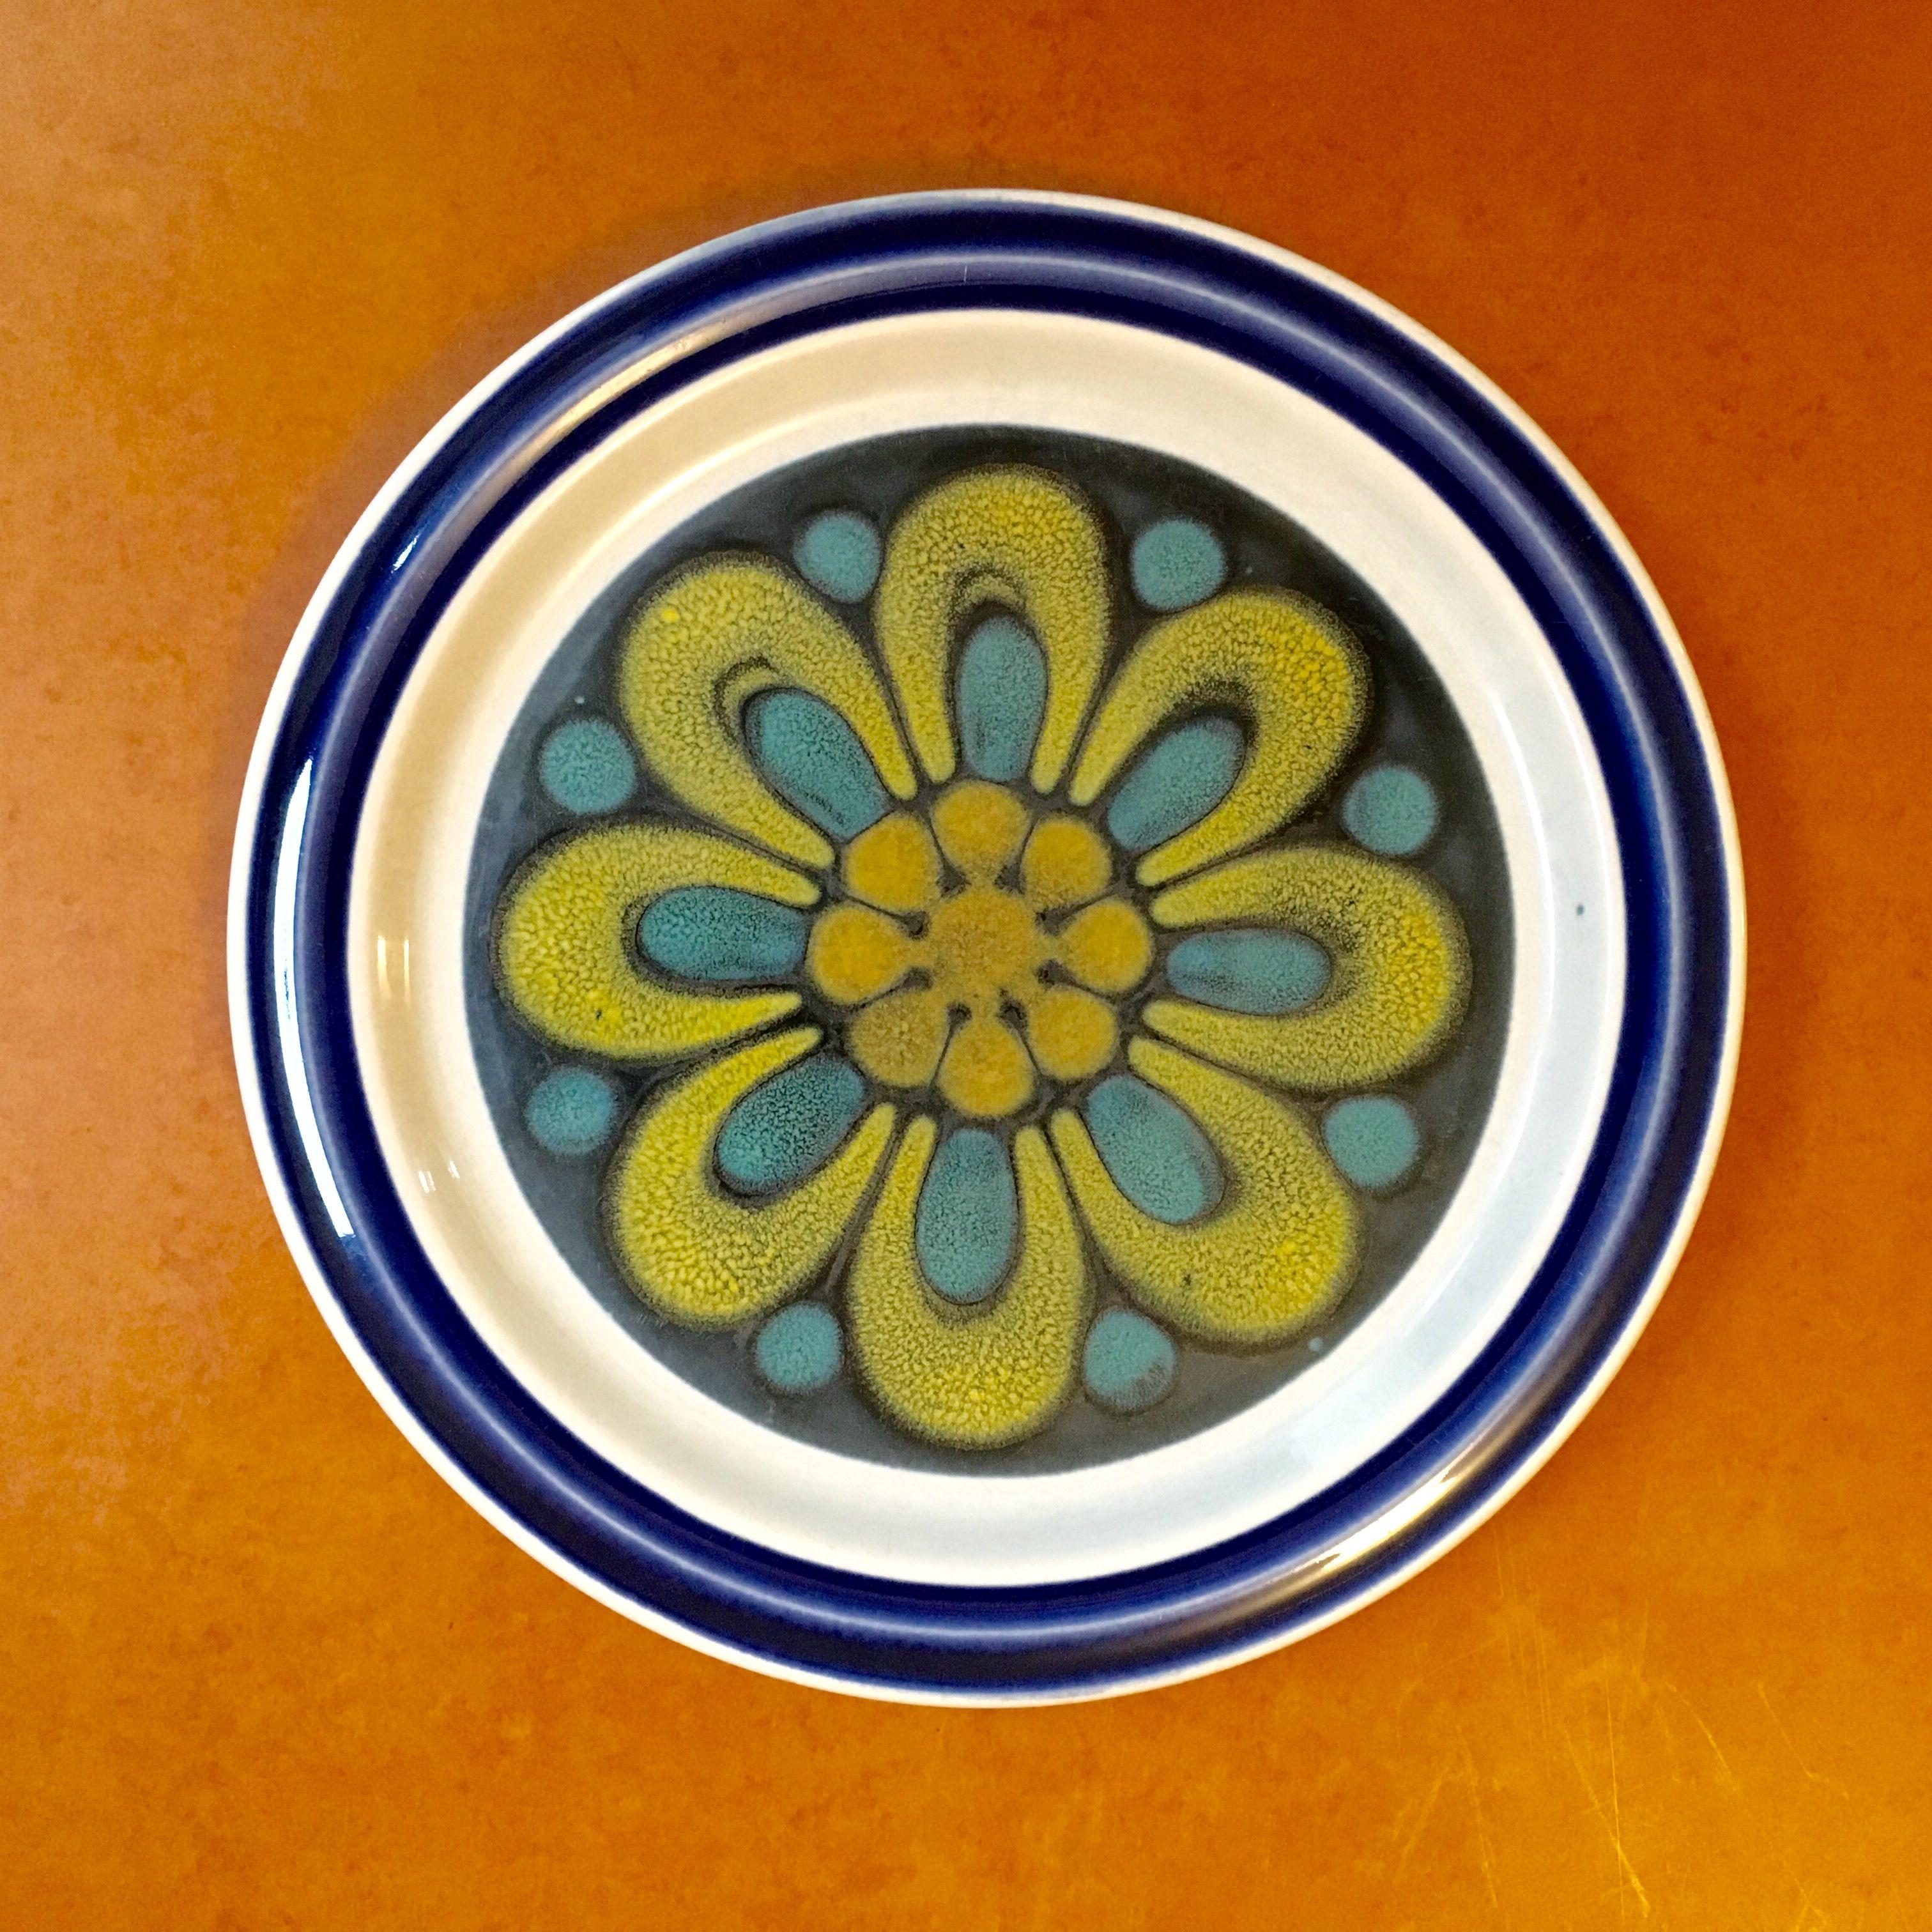 Acsons Genuine Stone Ware Belmont Dinner Plate Japan Vintage Dishes Ceramic Pottery Dinner Plates